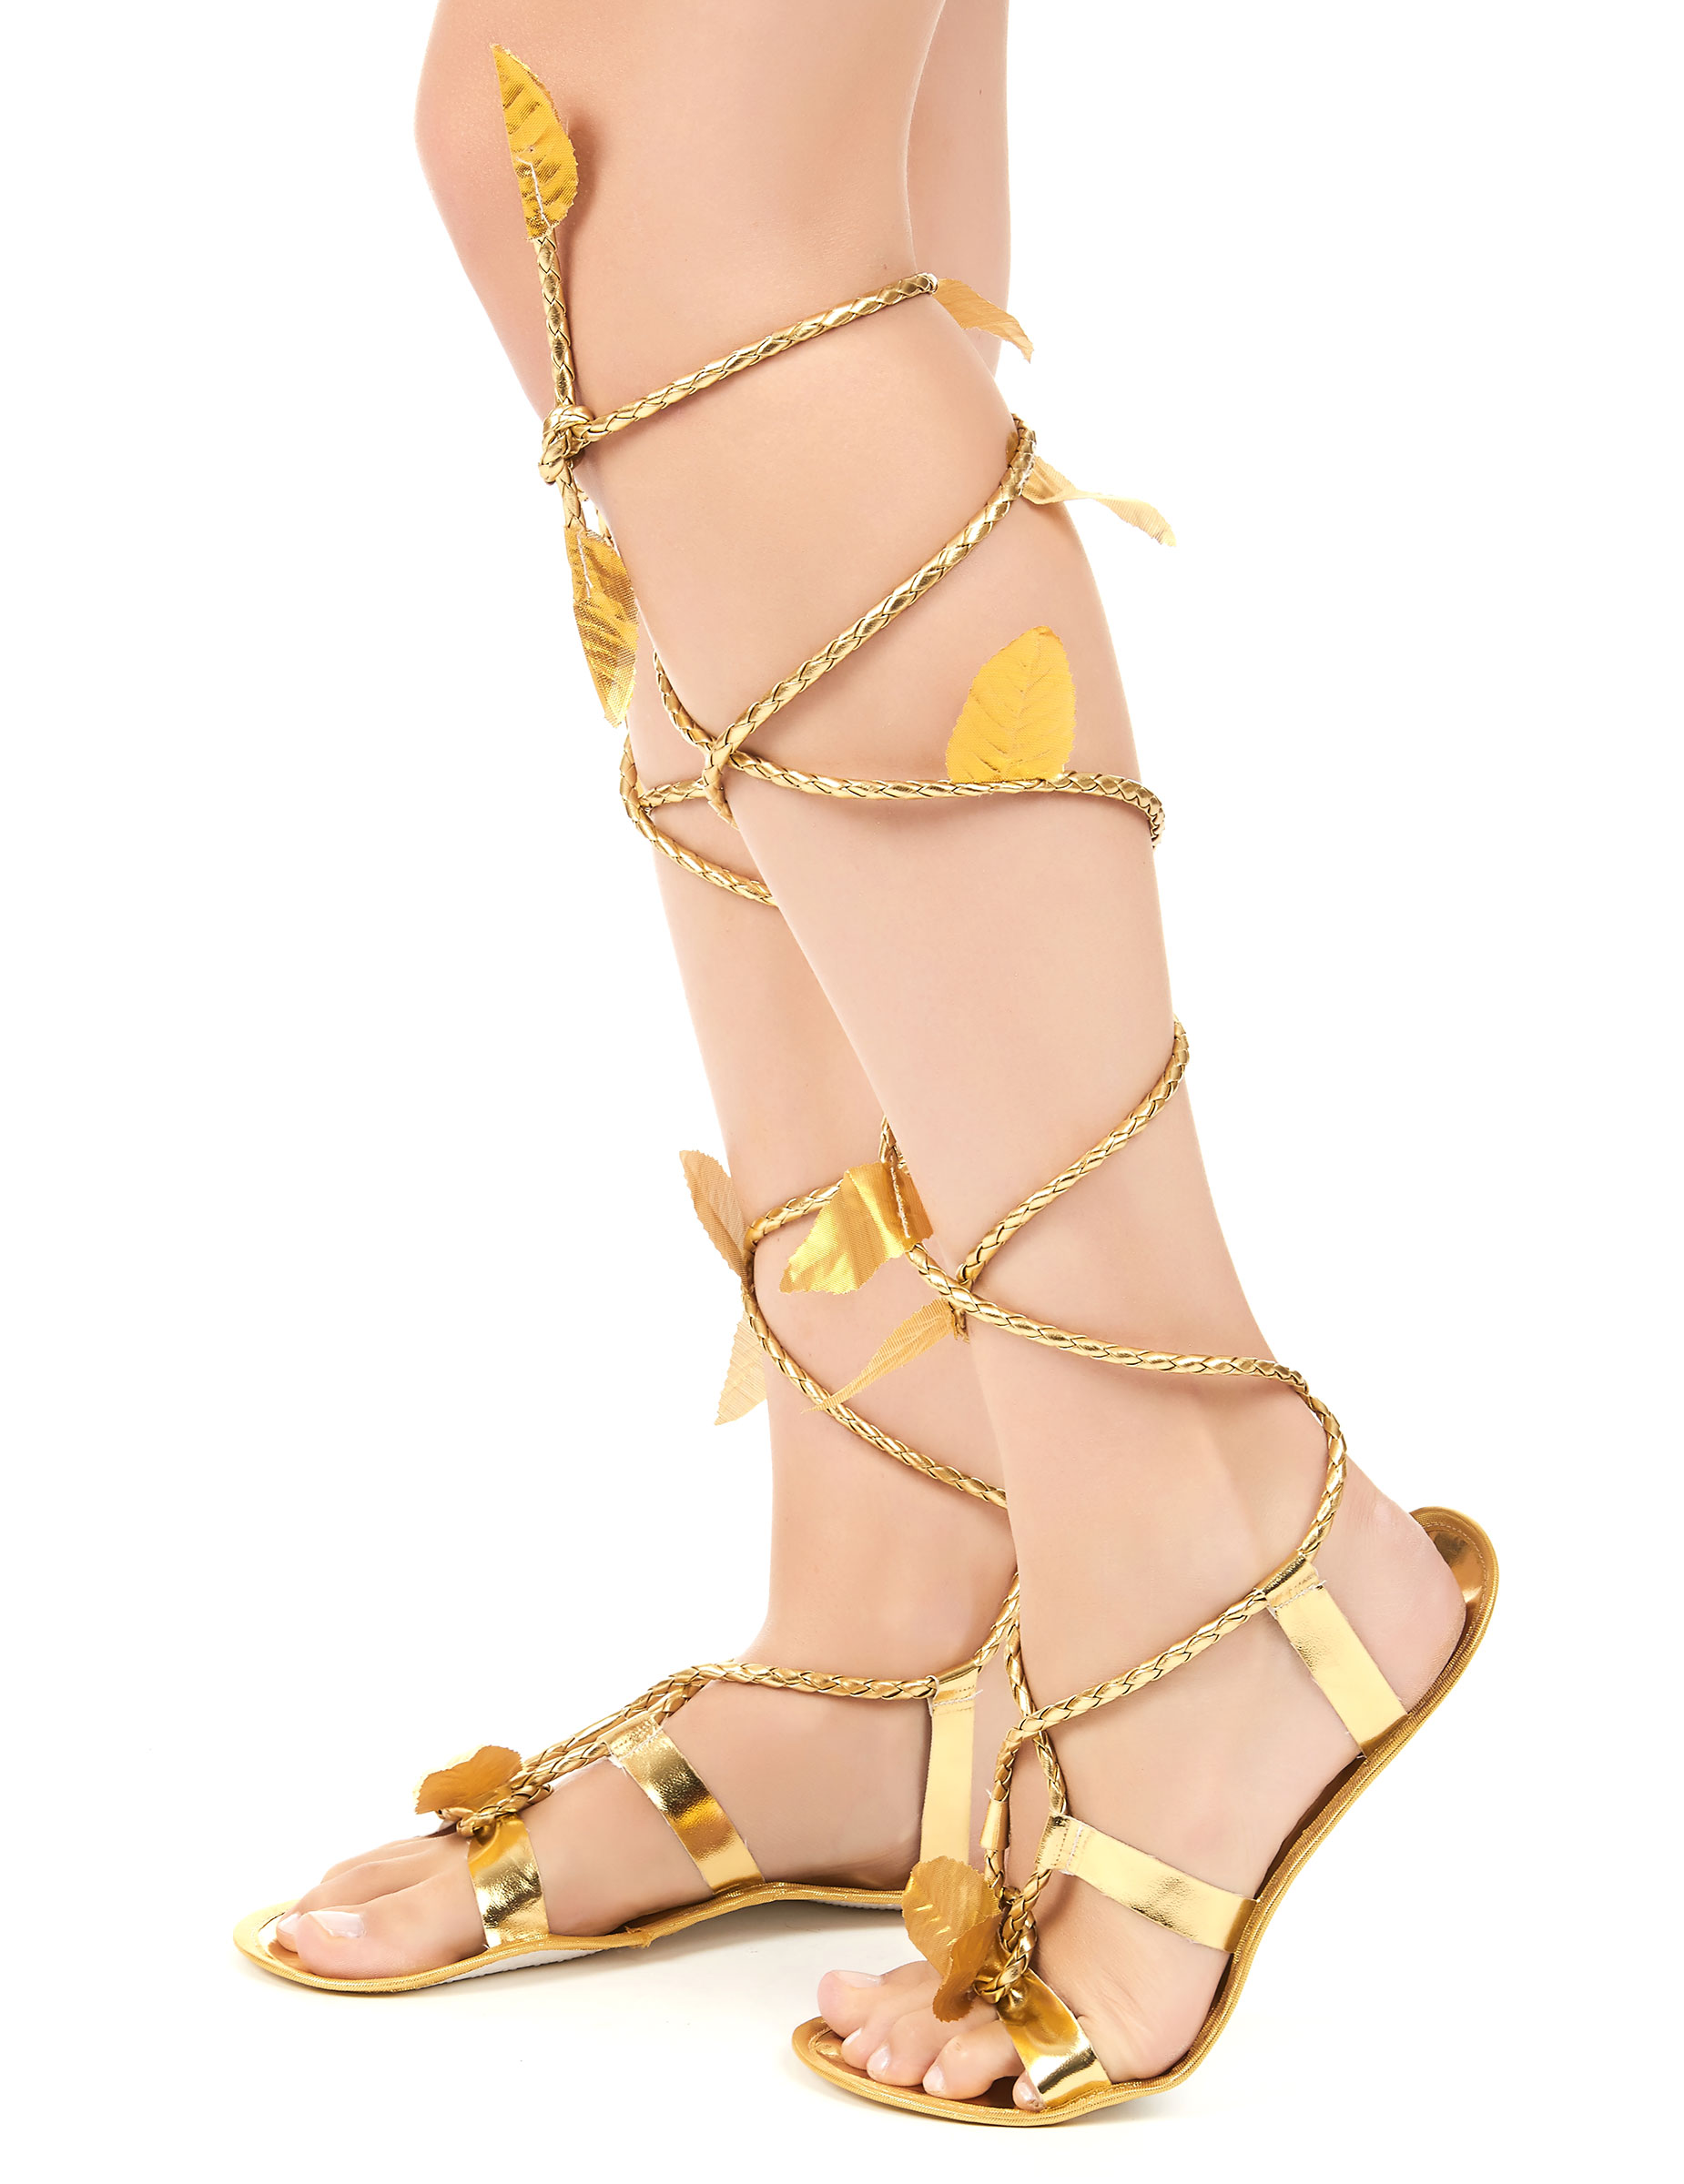 vrouwen sandaaltjes